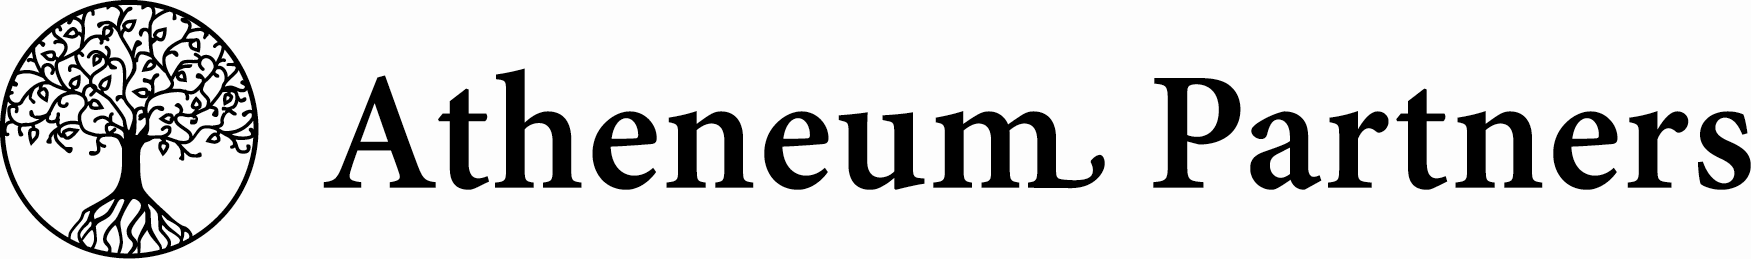 Atheneum Partners GmbH